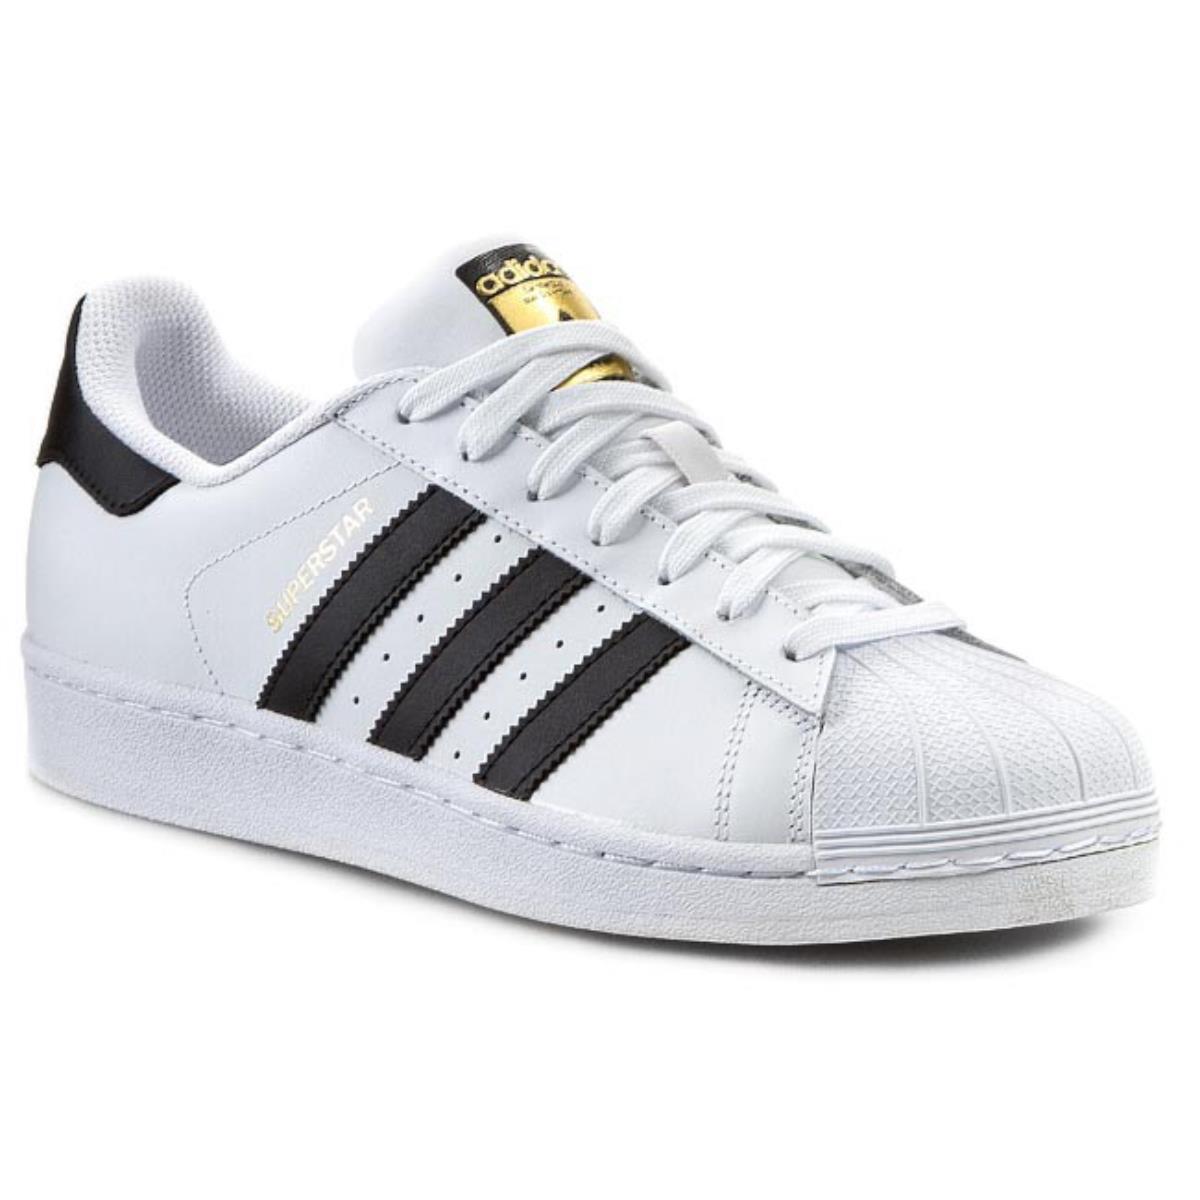 schuhe Adidas Superstar C77124 Bianco schwarz Calzature herren Turnschuhe Sportiva Nuov